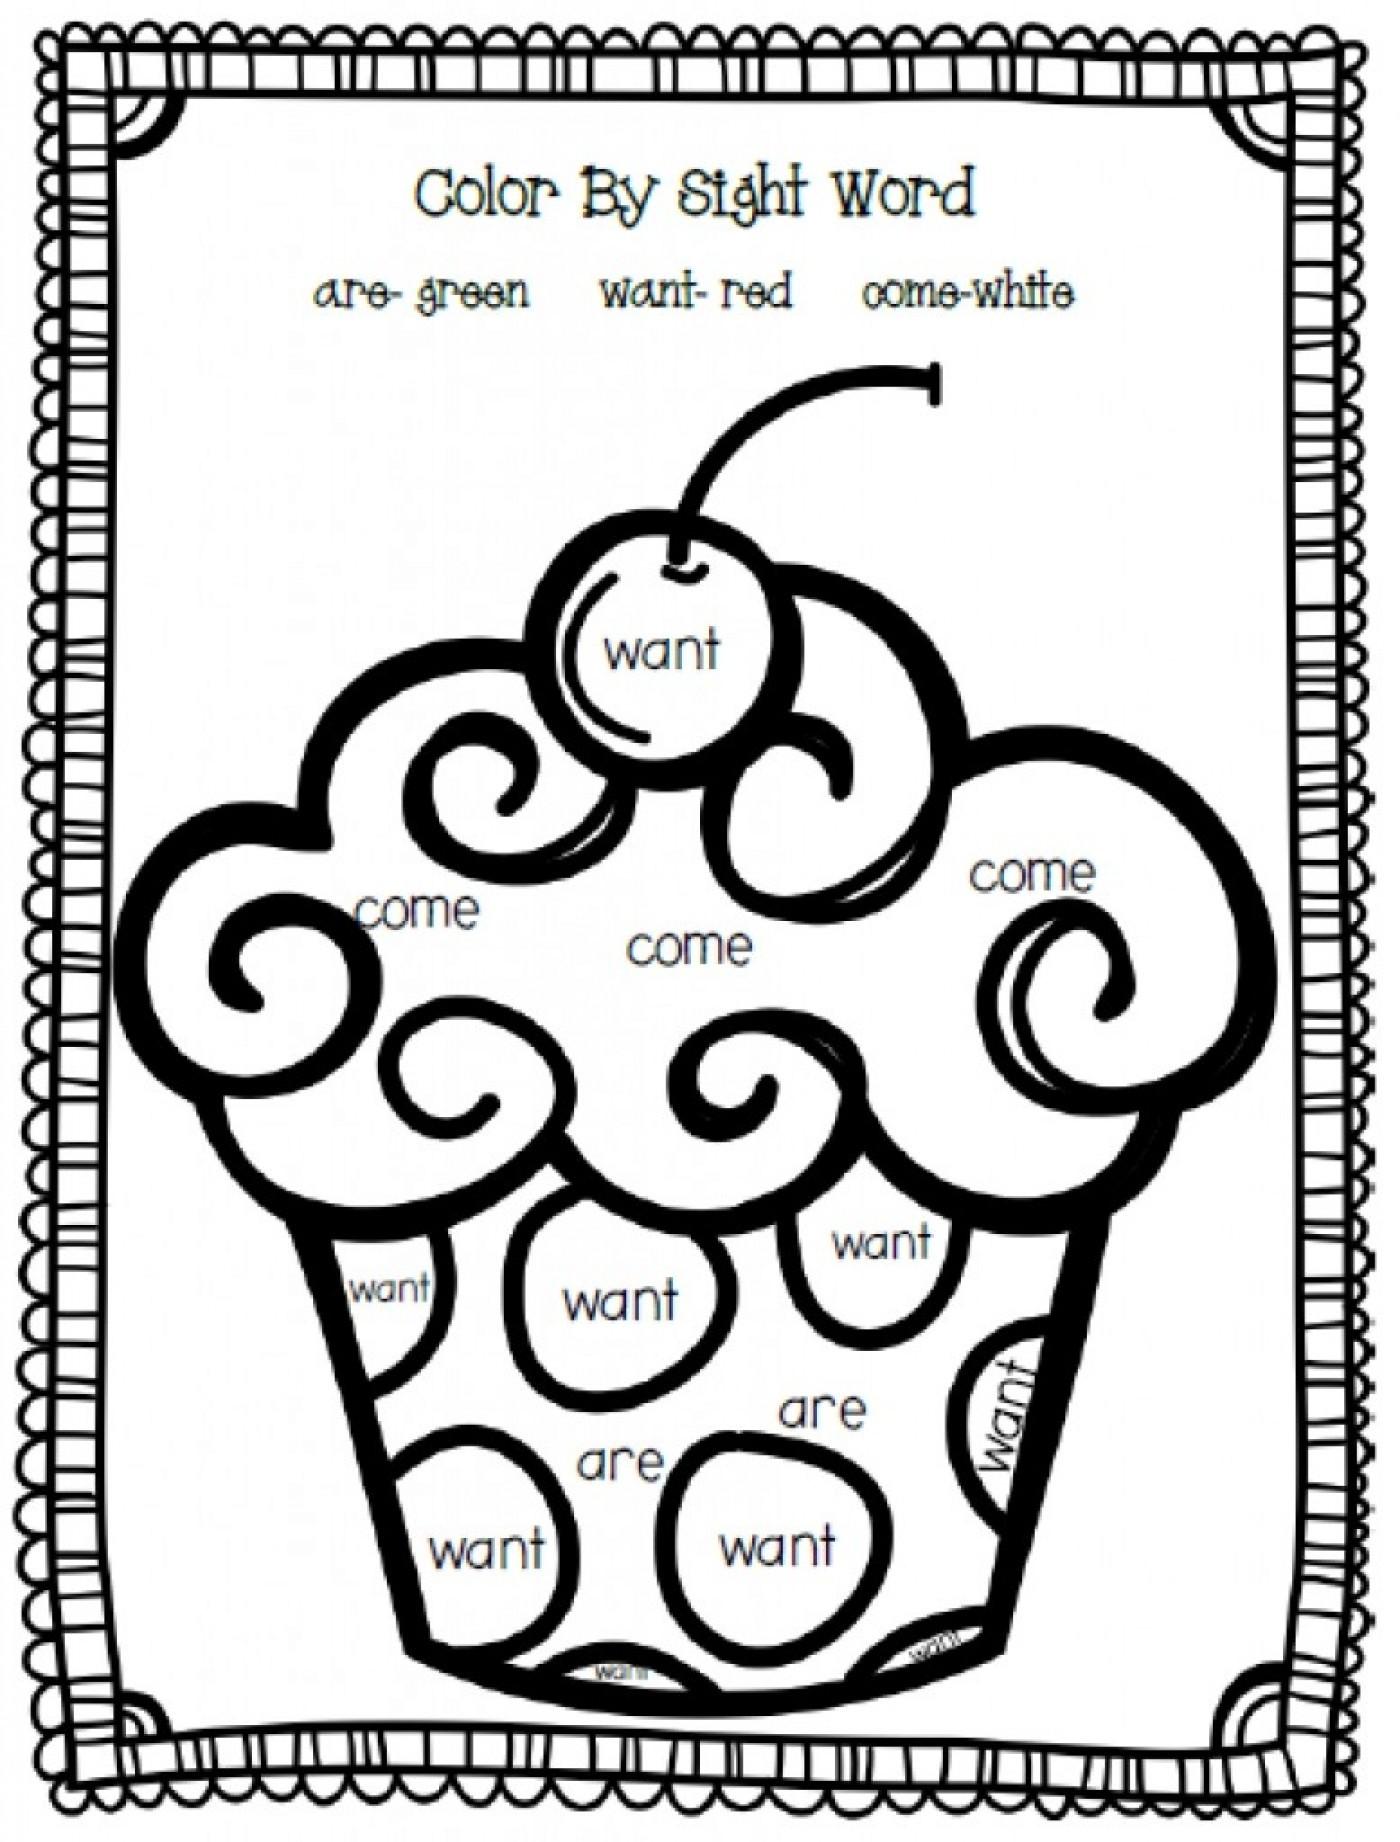 Kindergarten Sight Word Coloring Worksheets Coloring Worksheet High Frequency Word Have Printable Free